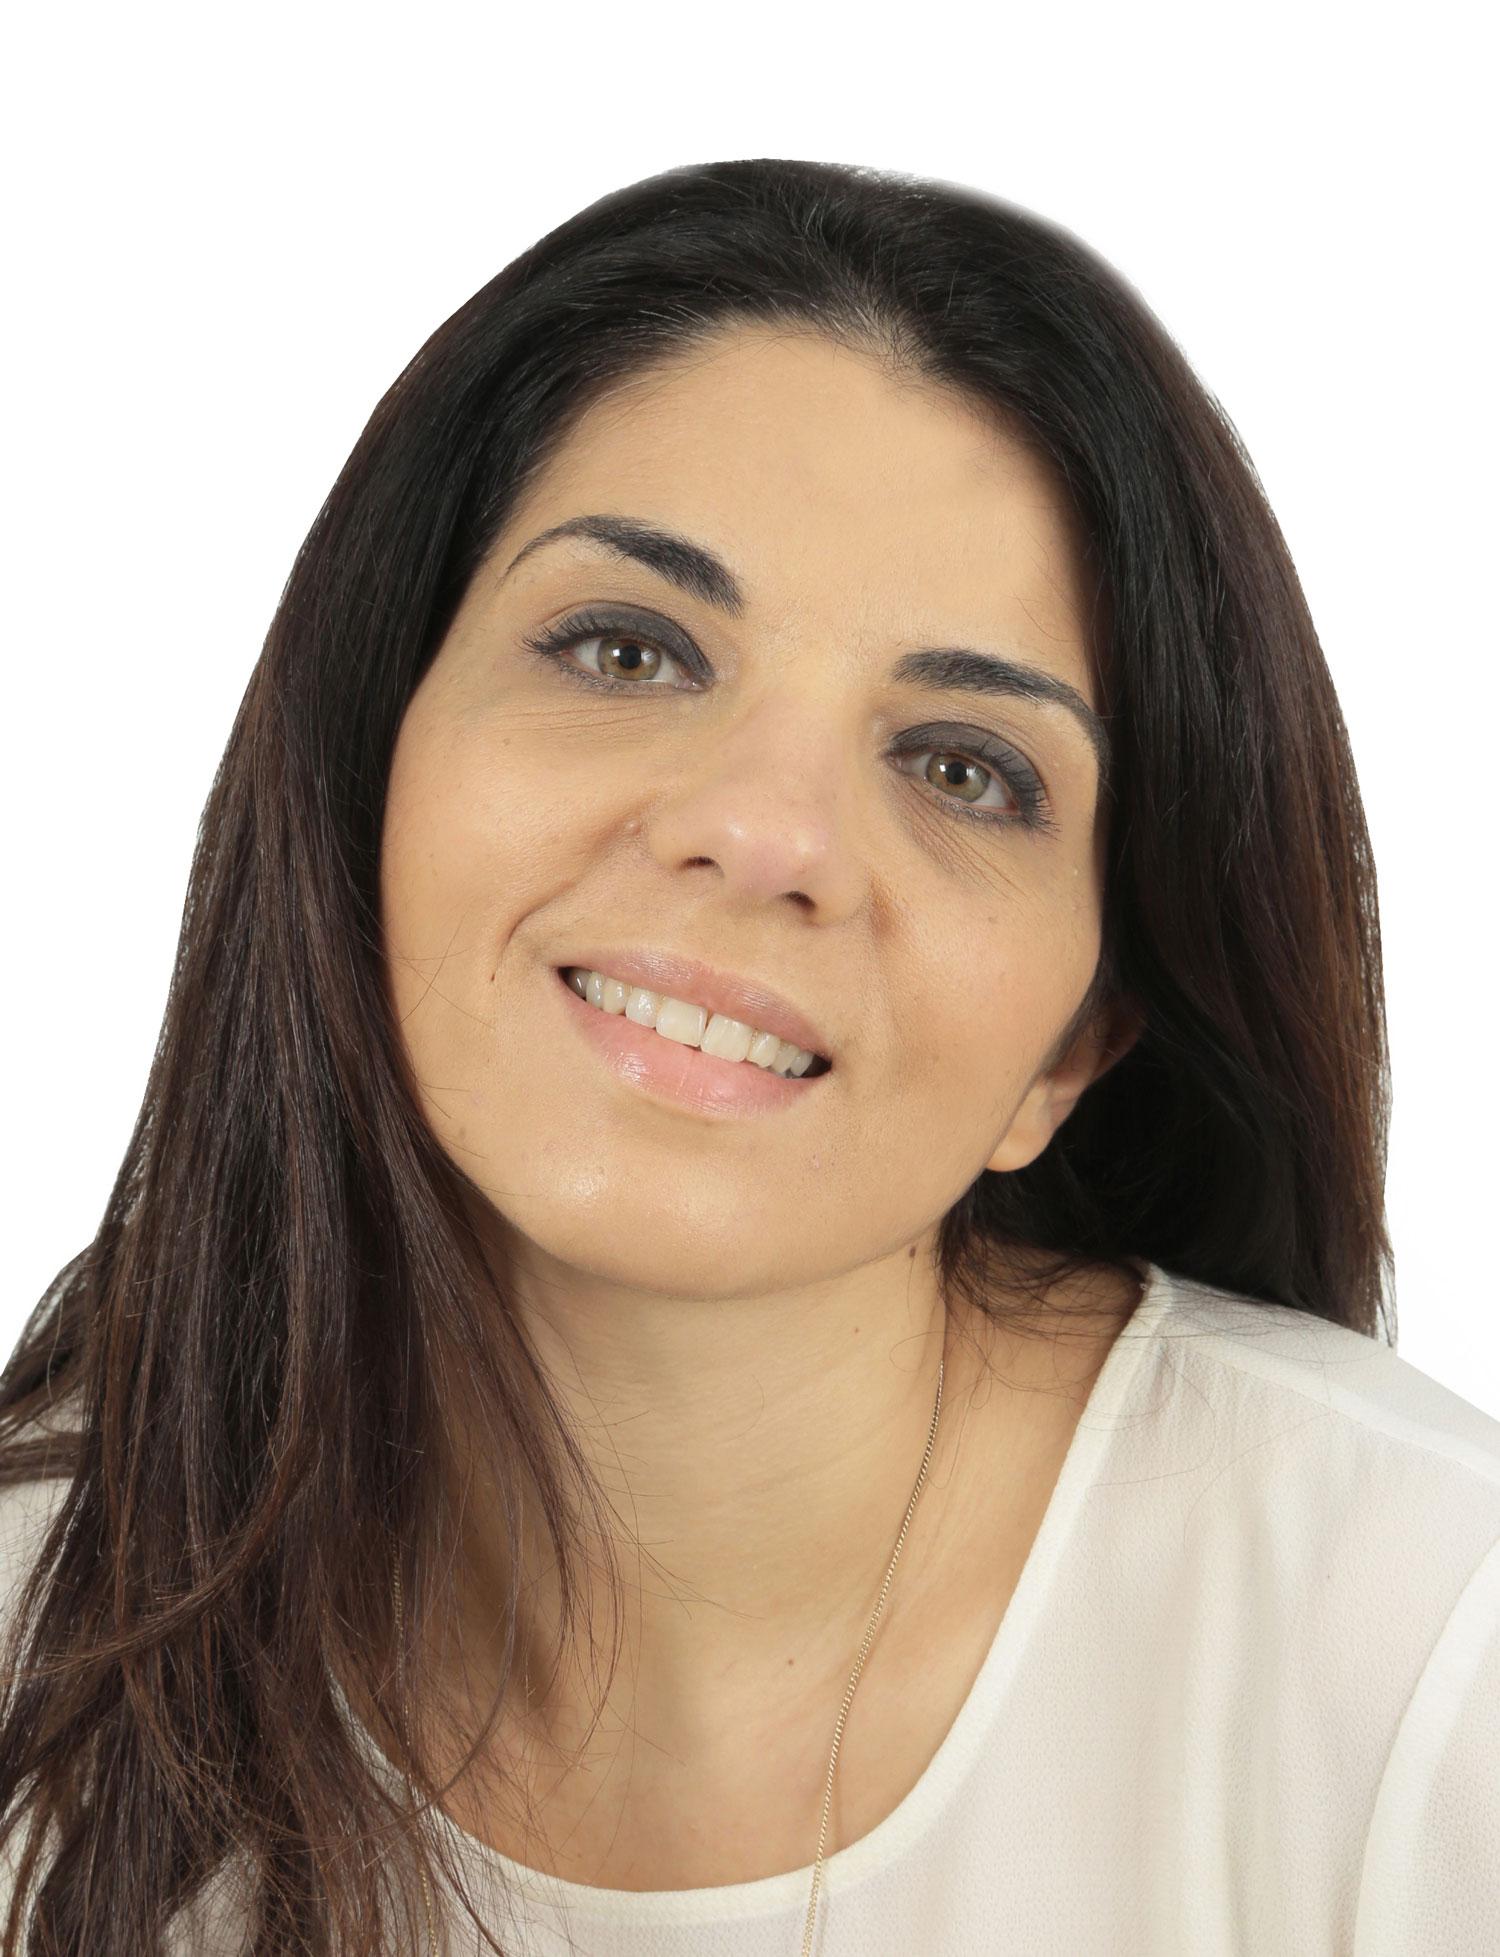 Chiara Petrolito